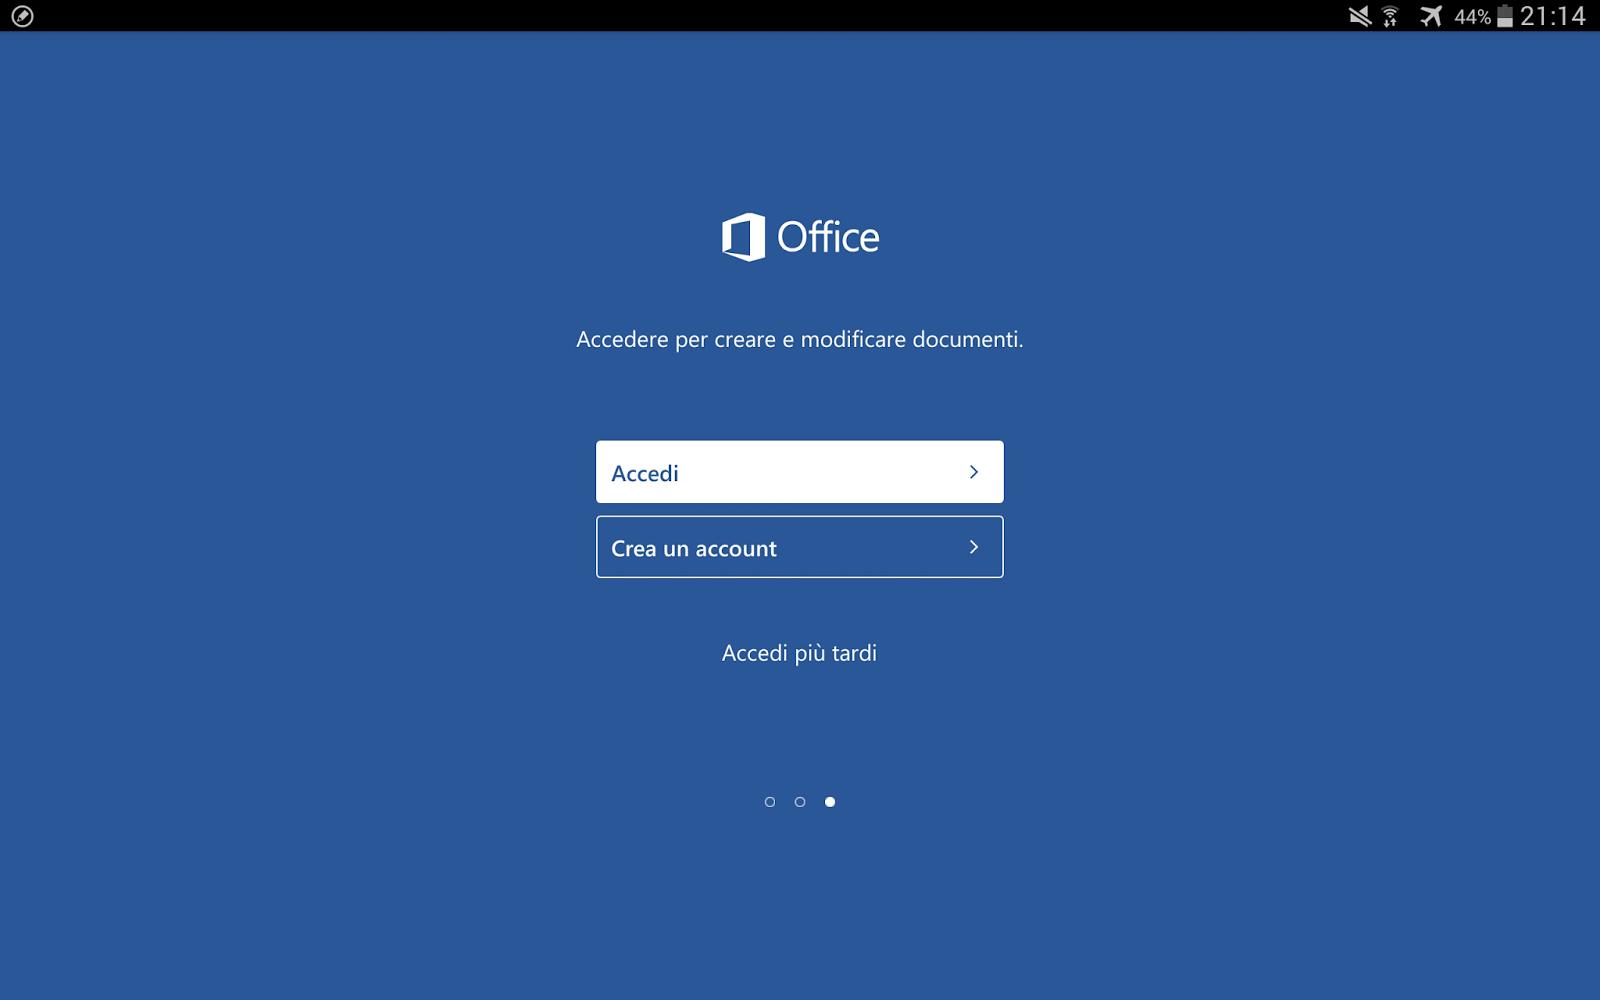 schermata di login/registrazione nei servizi Microsoft in word per tablet